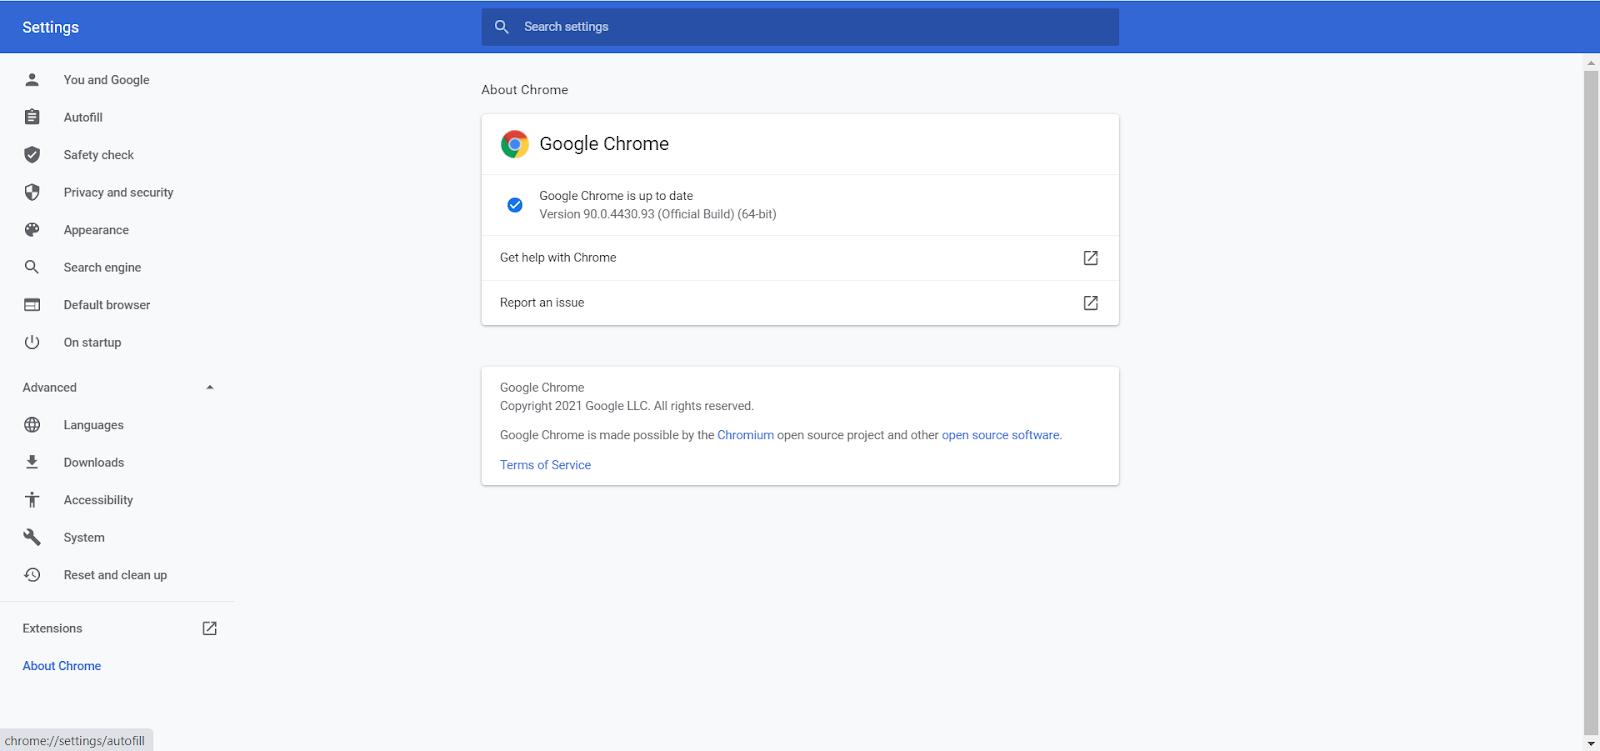 ERR_CACHE_MISS - Chrome Settings